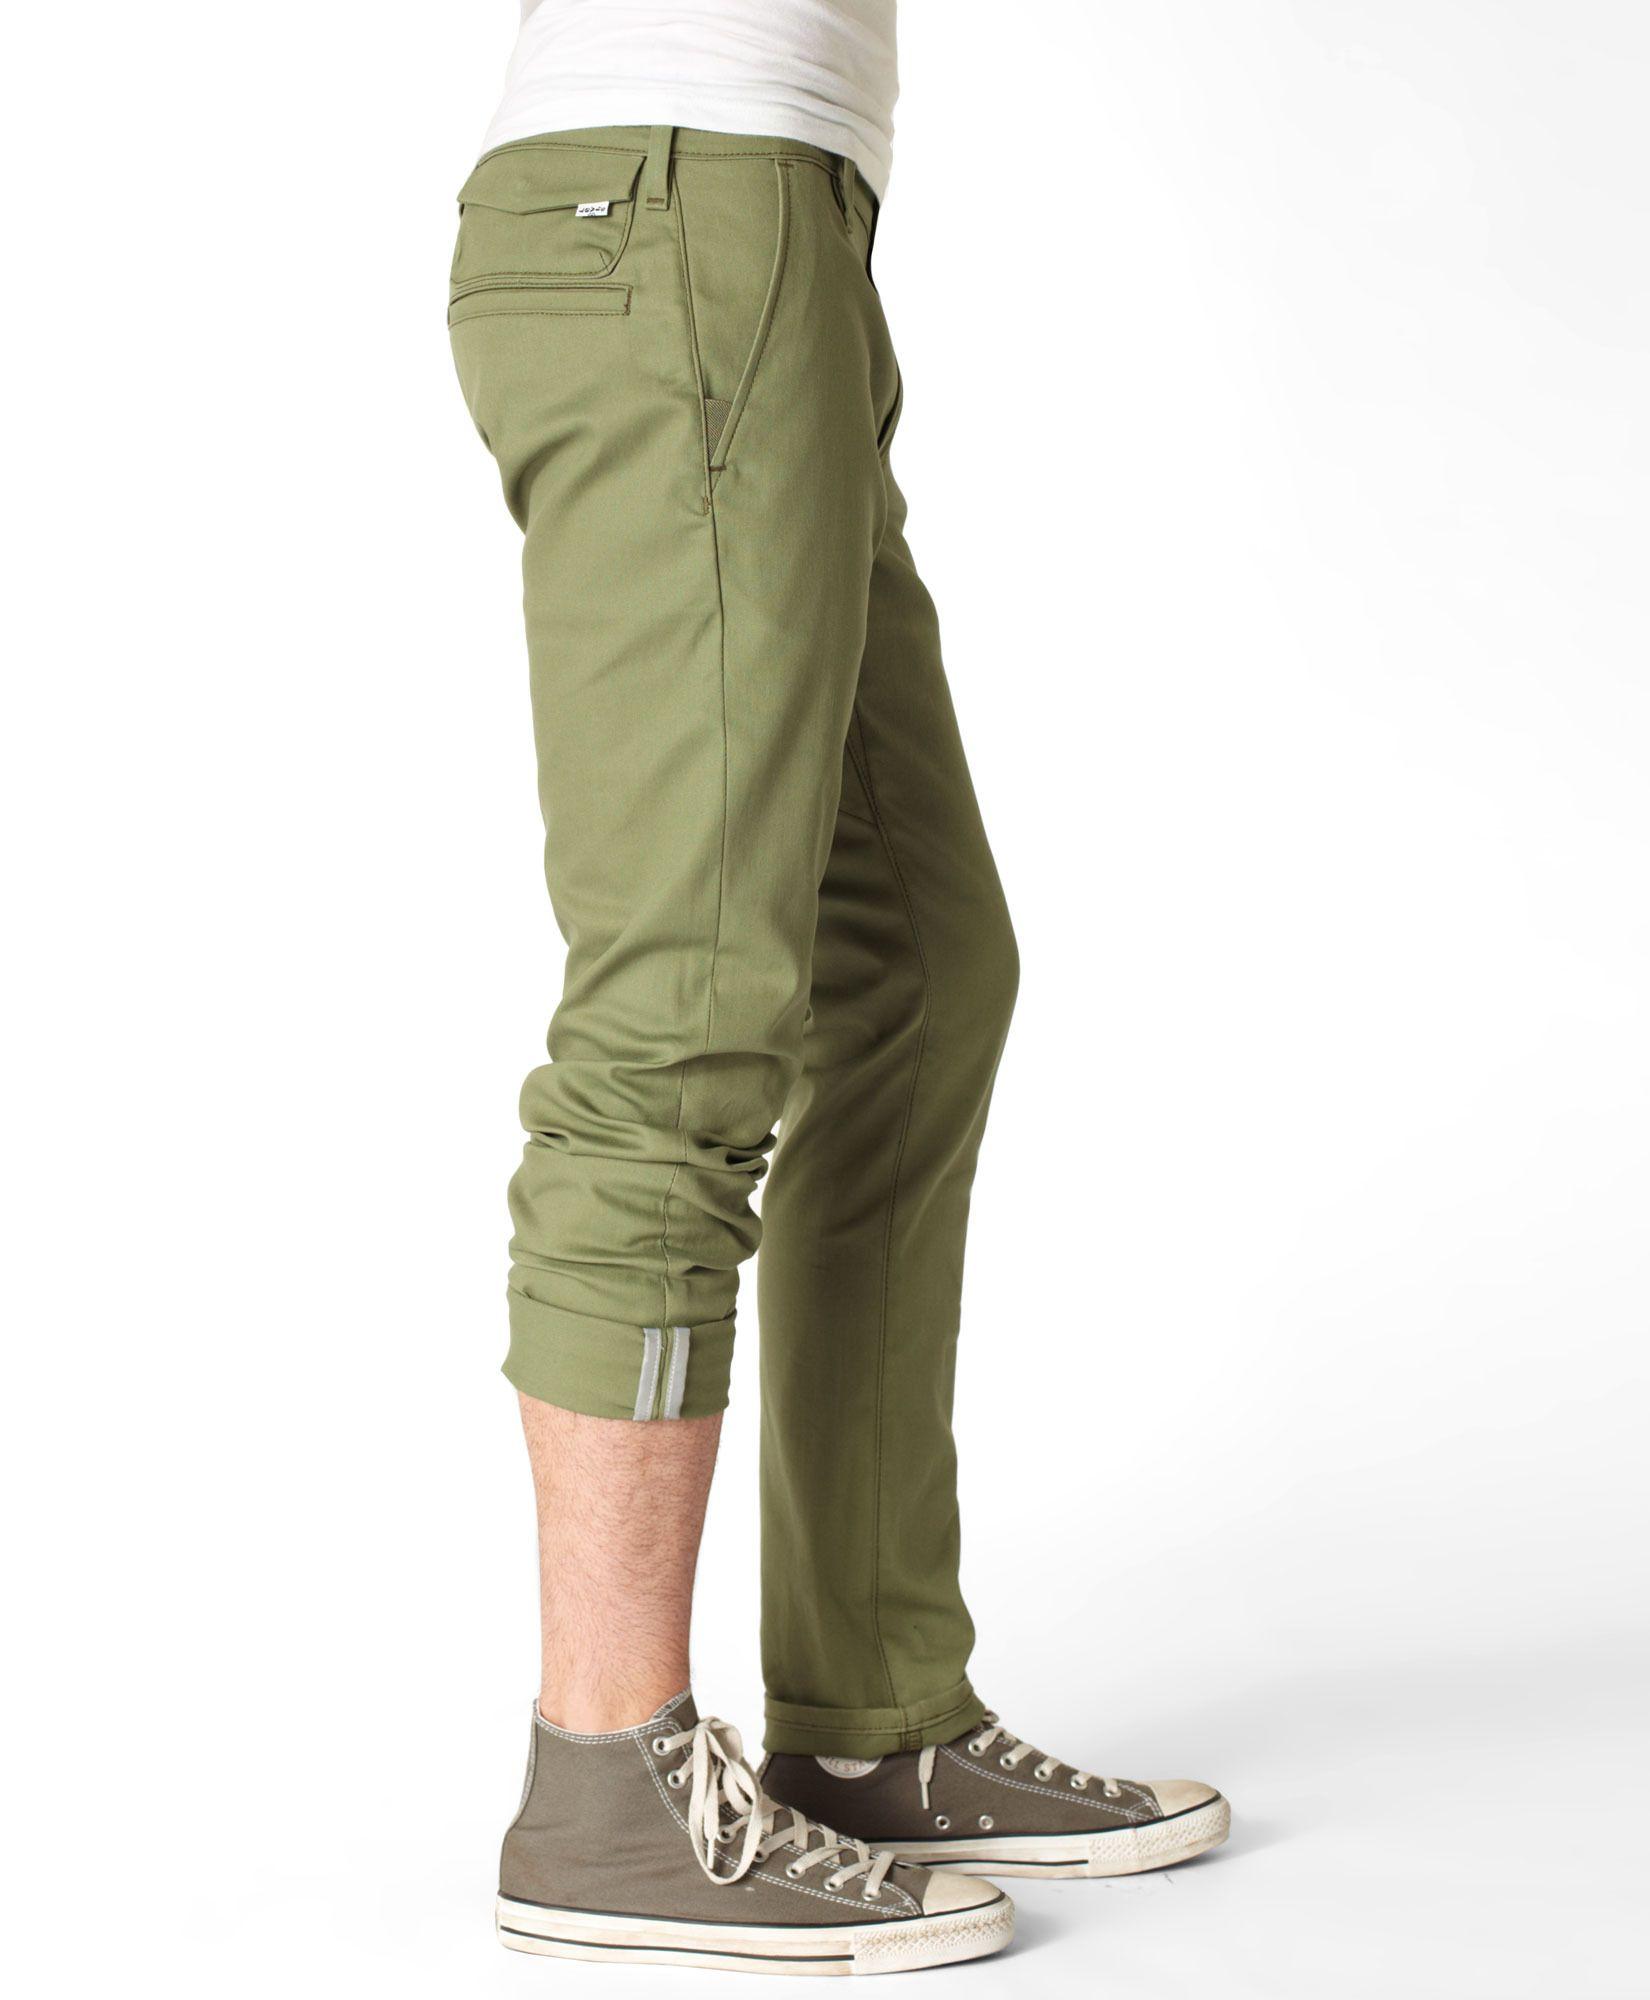 29581505c60b1b Levi's 511 commuter trousers | Men's Fashion in 2019 | Bike style ...